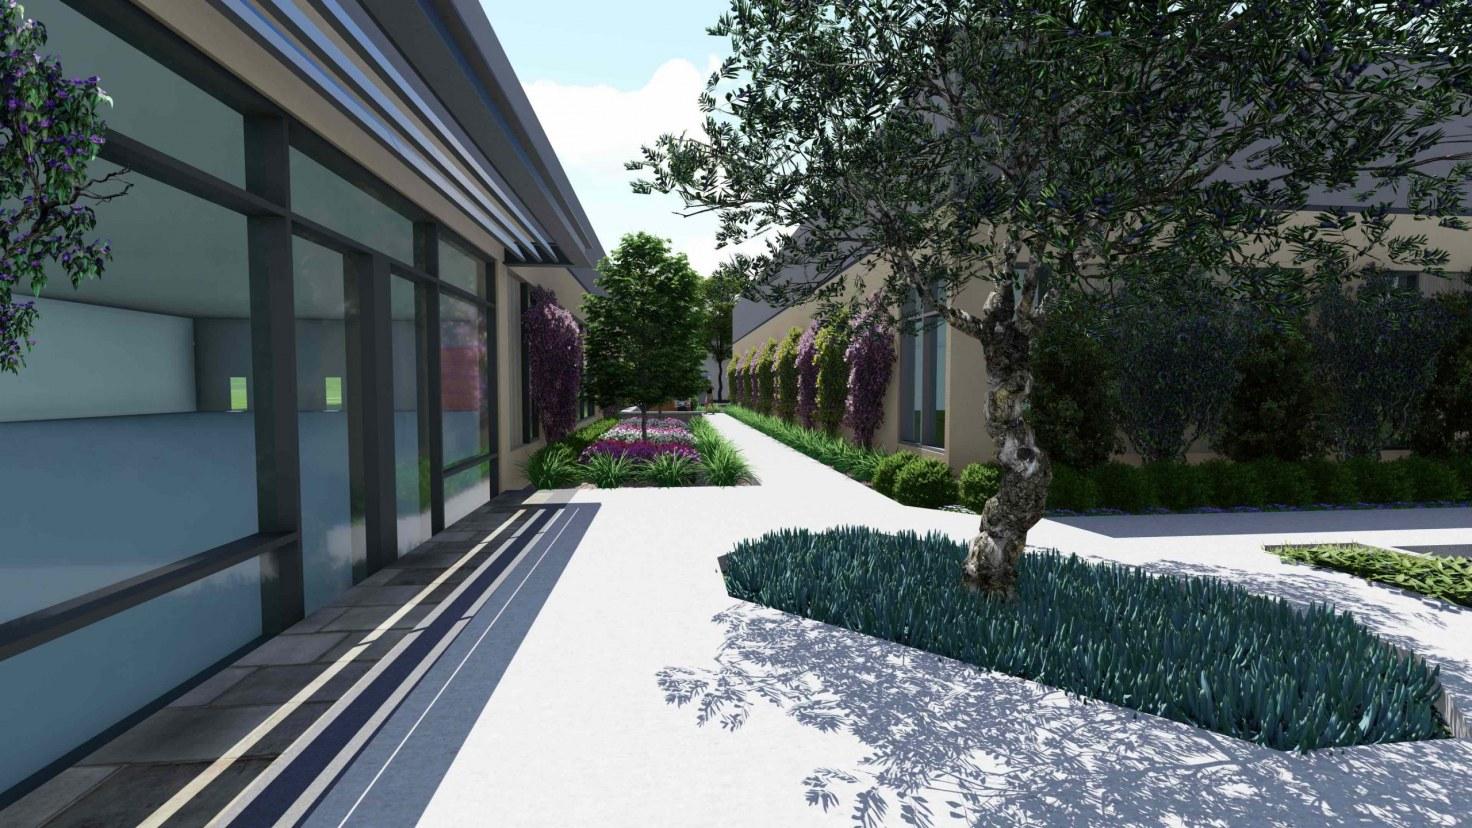 Adhor Lane Landscape Development Inc.